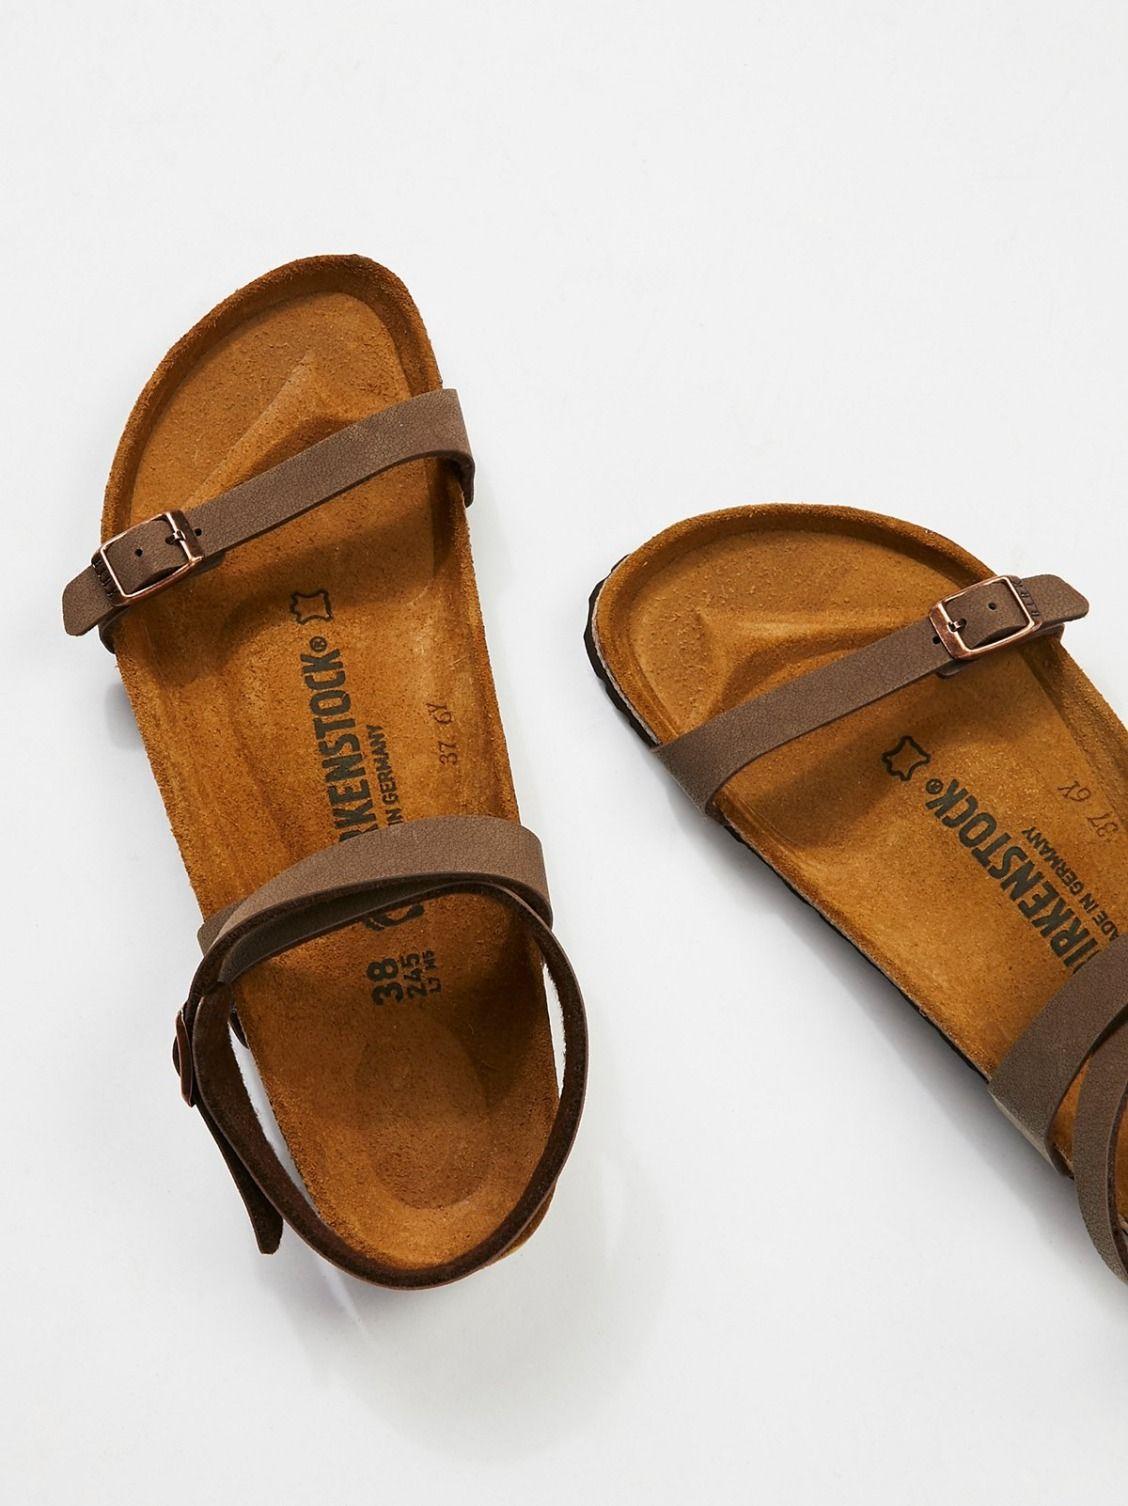 18cc0da702c7 Daloa Birkenstock Sandal